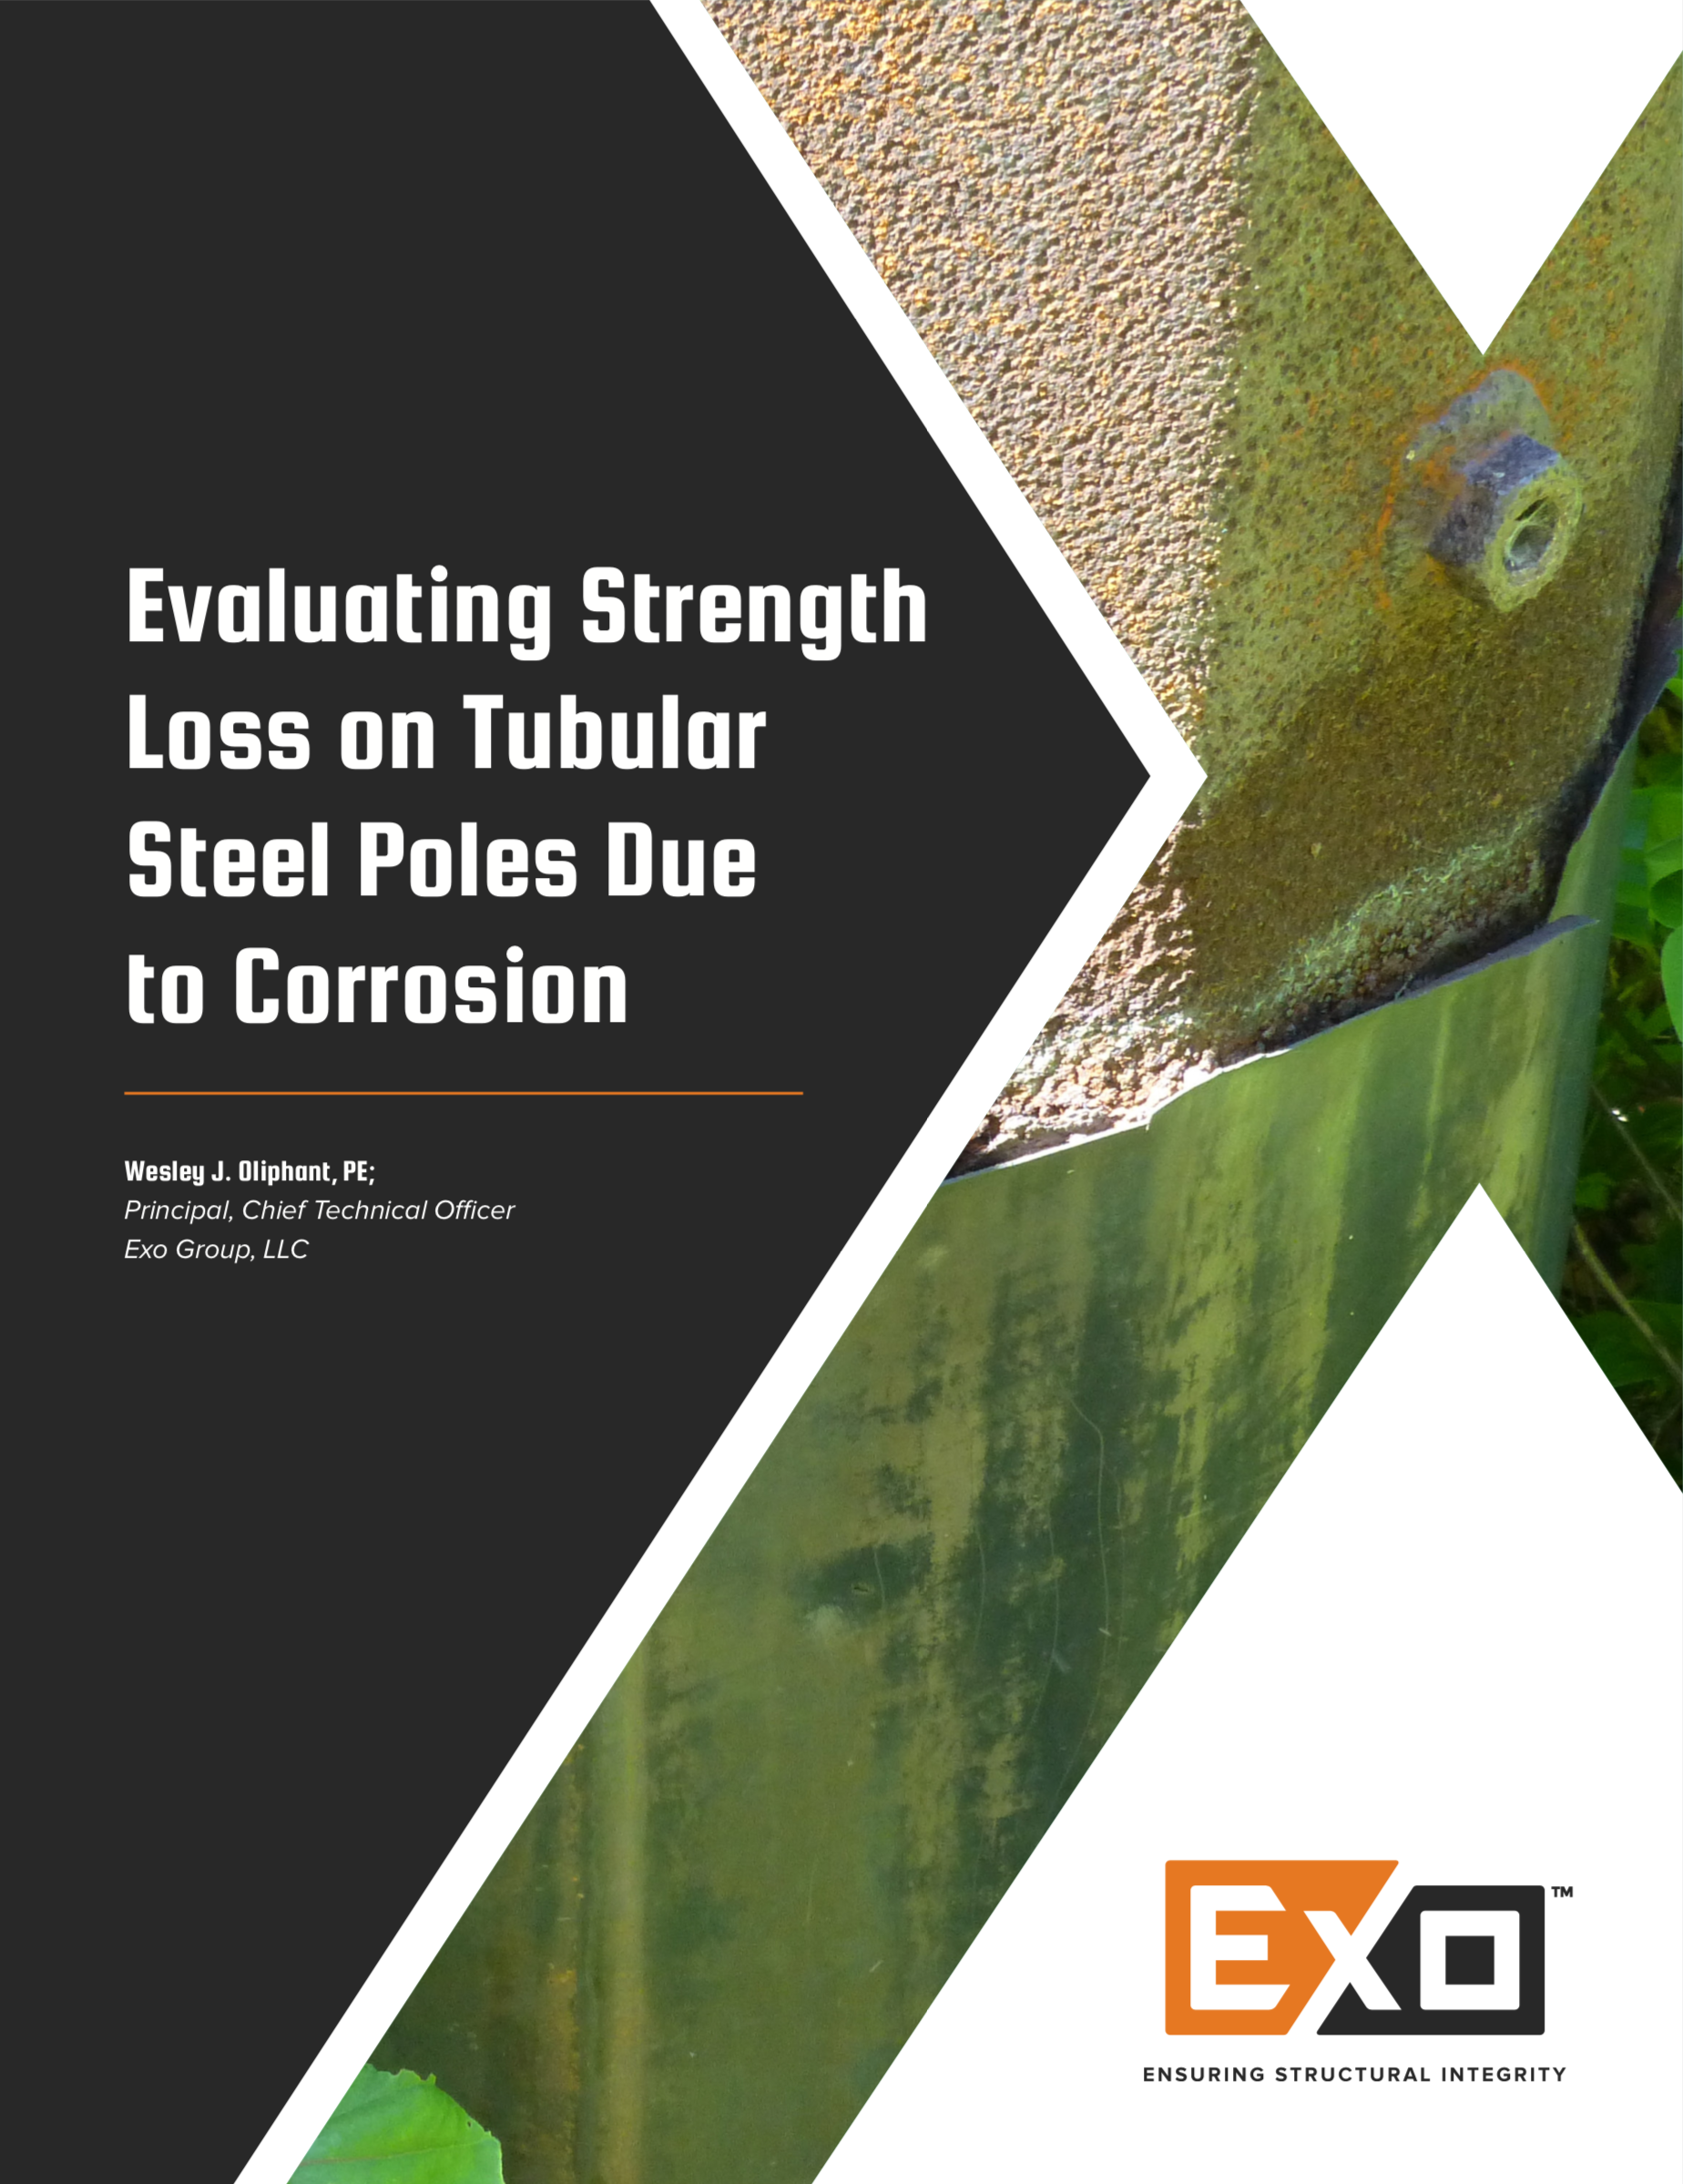 Evaluated Strength Loss on Tubular Steel Poles